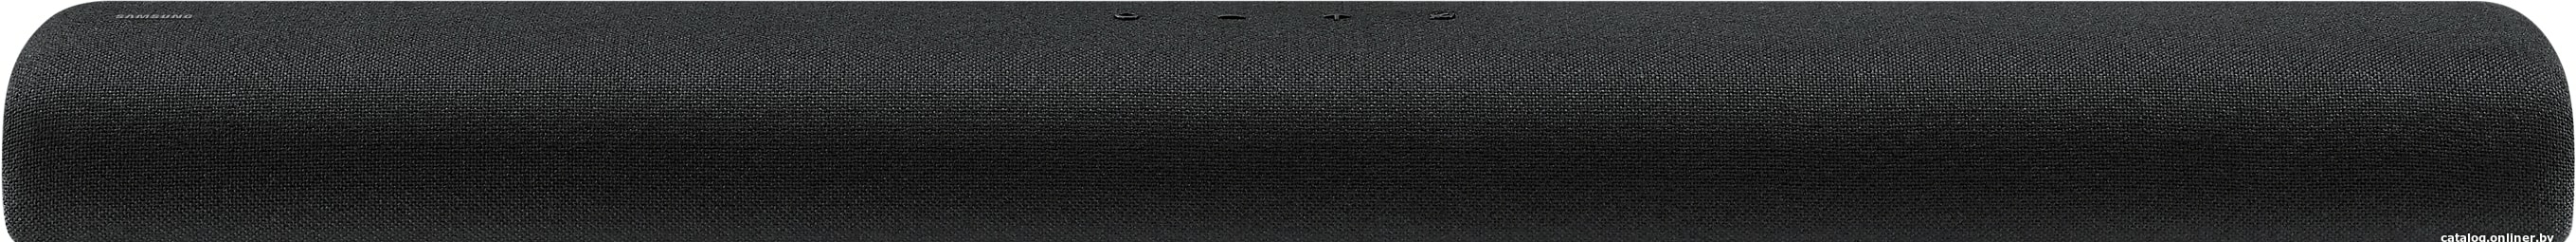 Саундбар Samsung HW-S60A